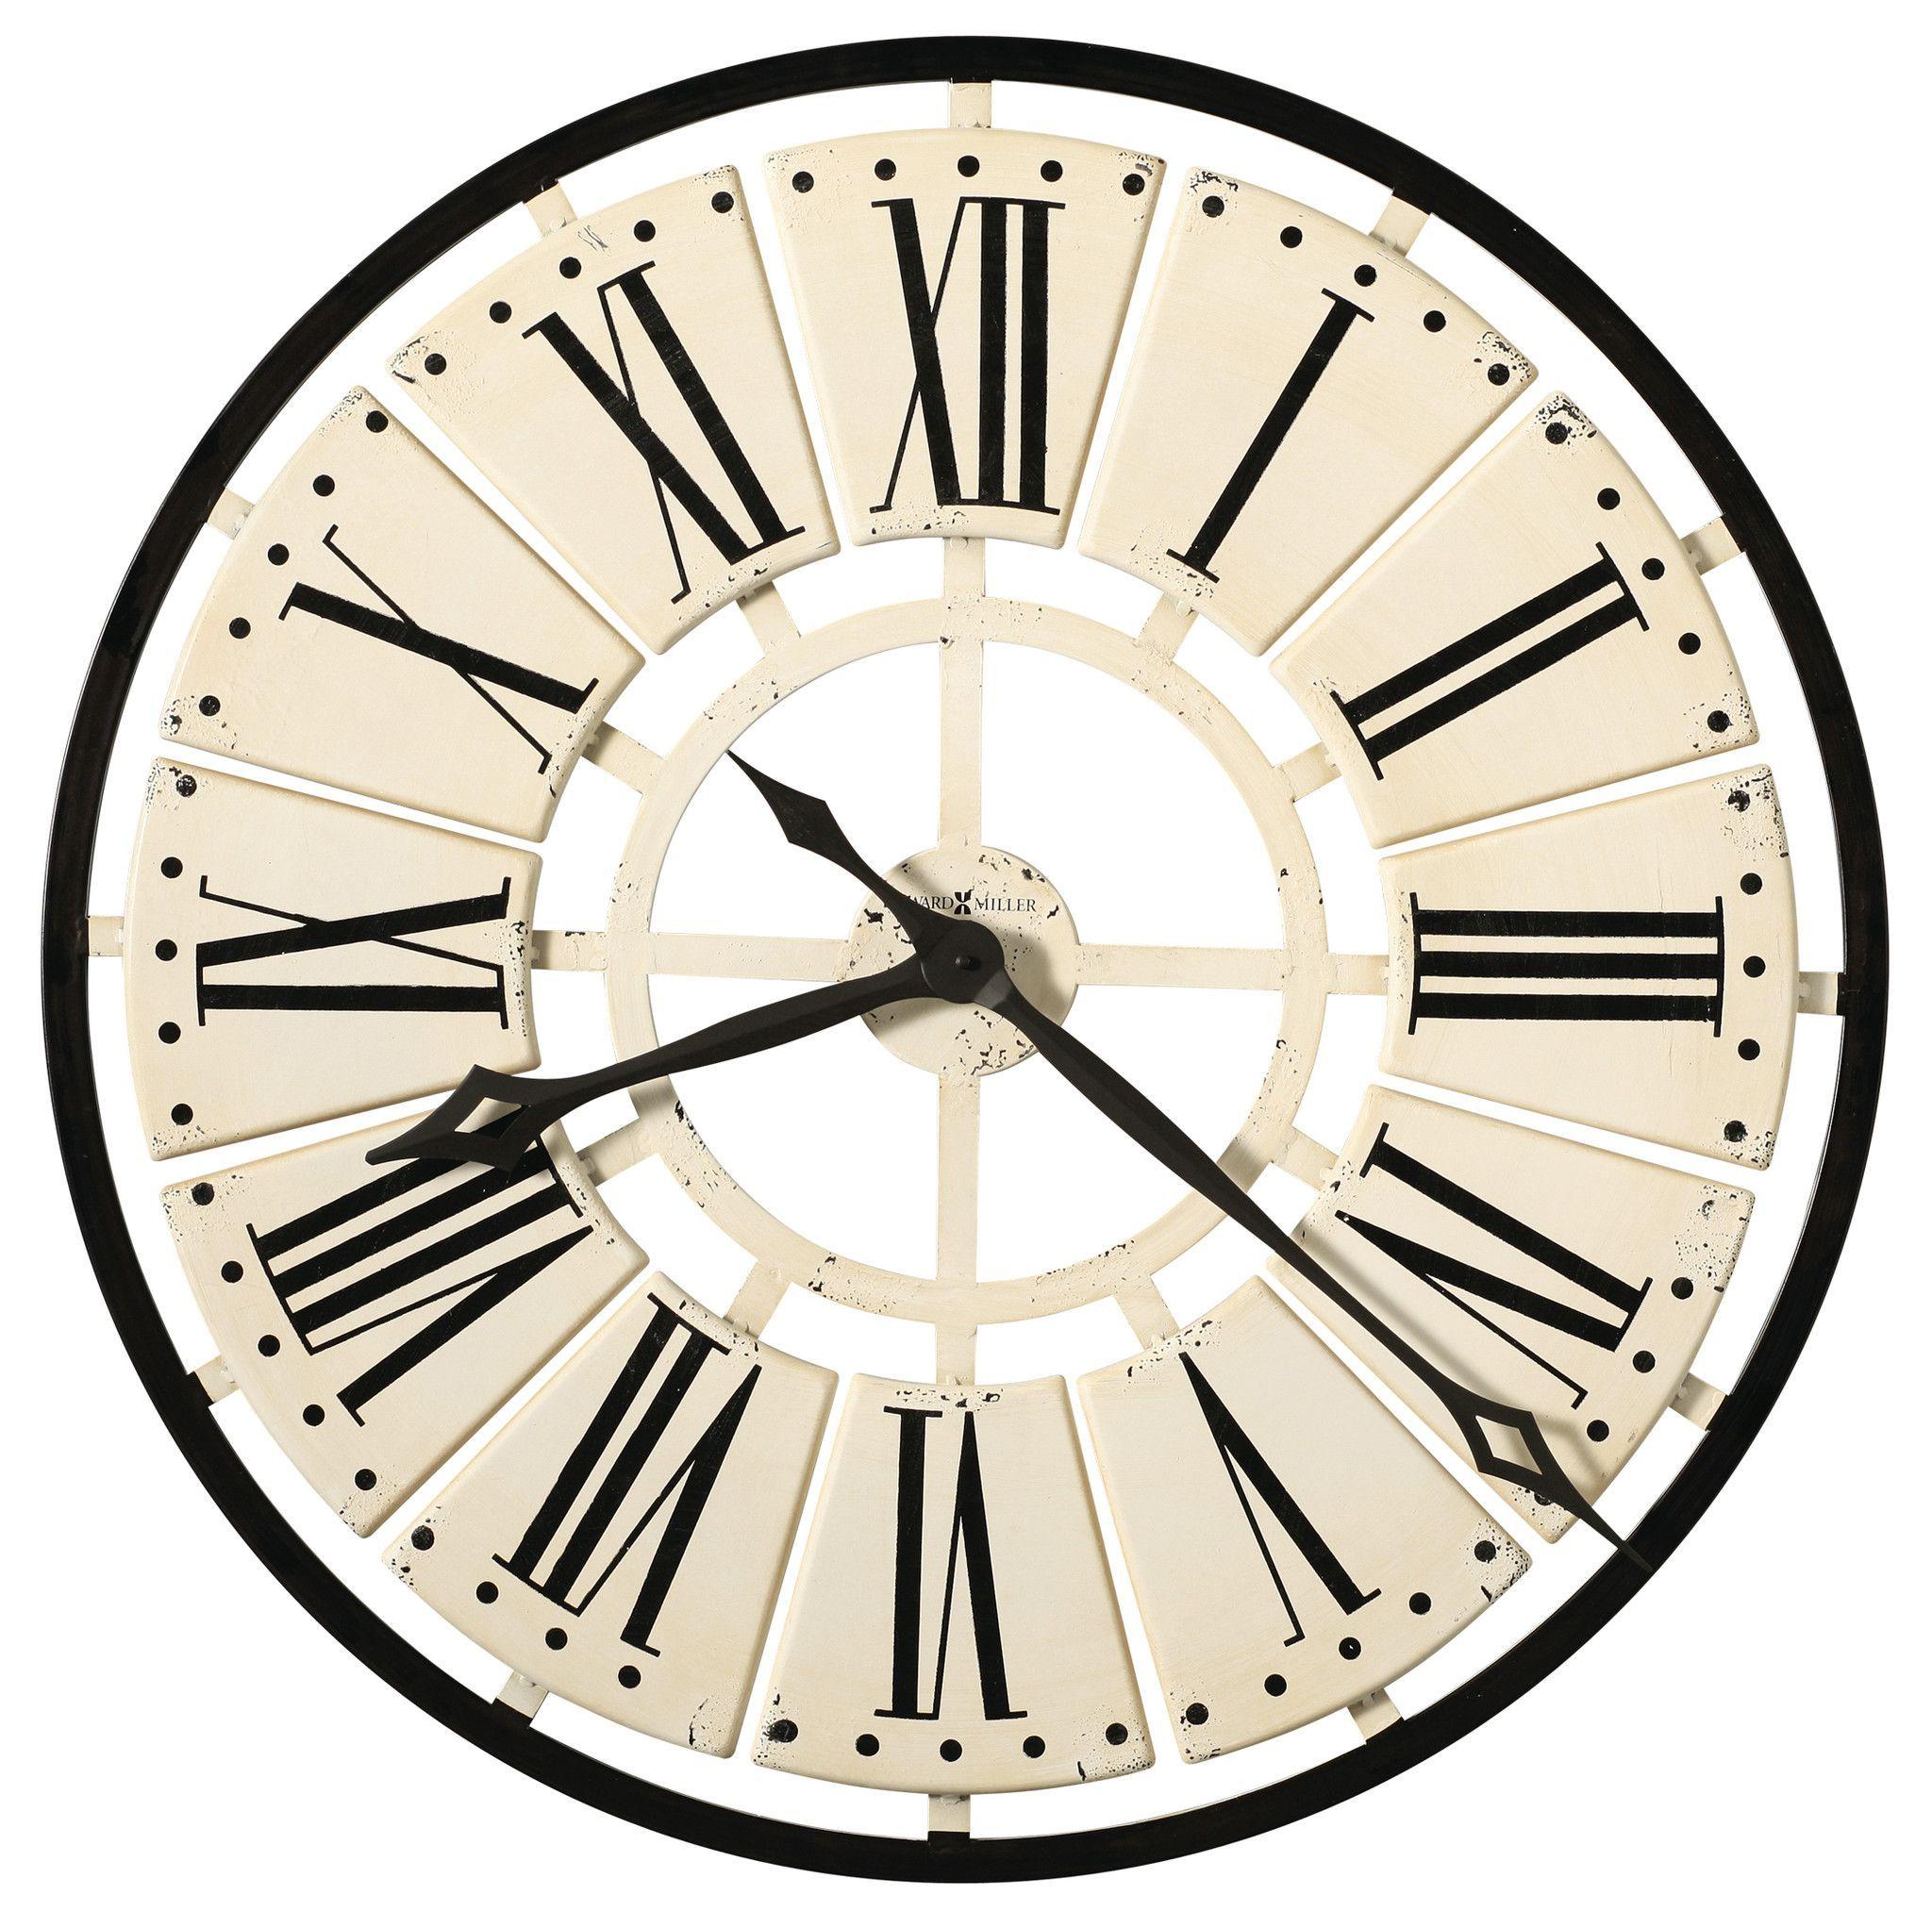 Pierre Wall Clock Oversized Wall Clock White Wall Clocks Gallery Wall Clock